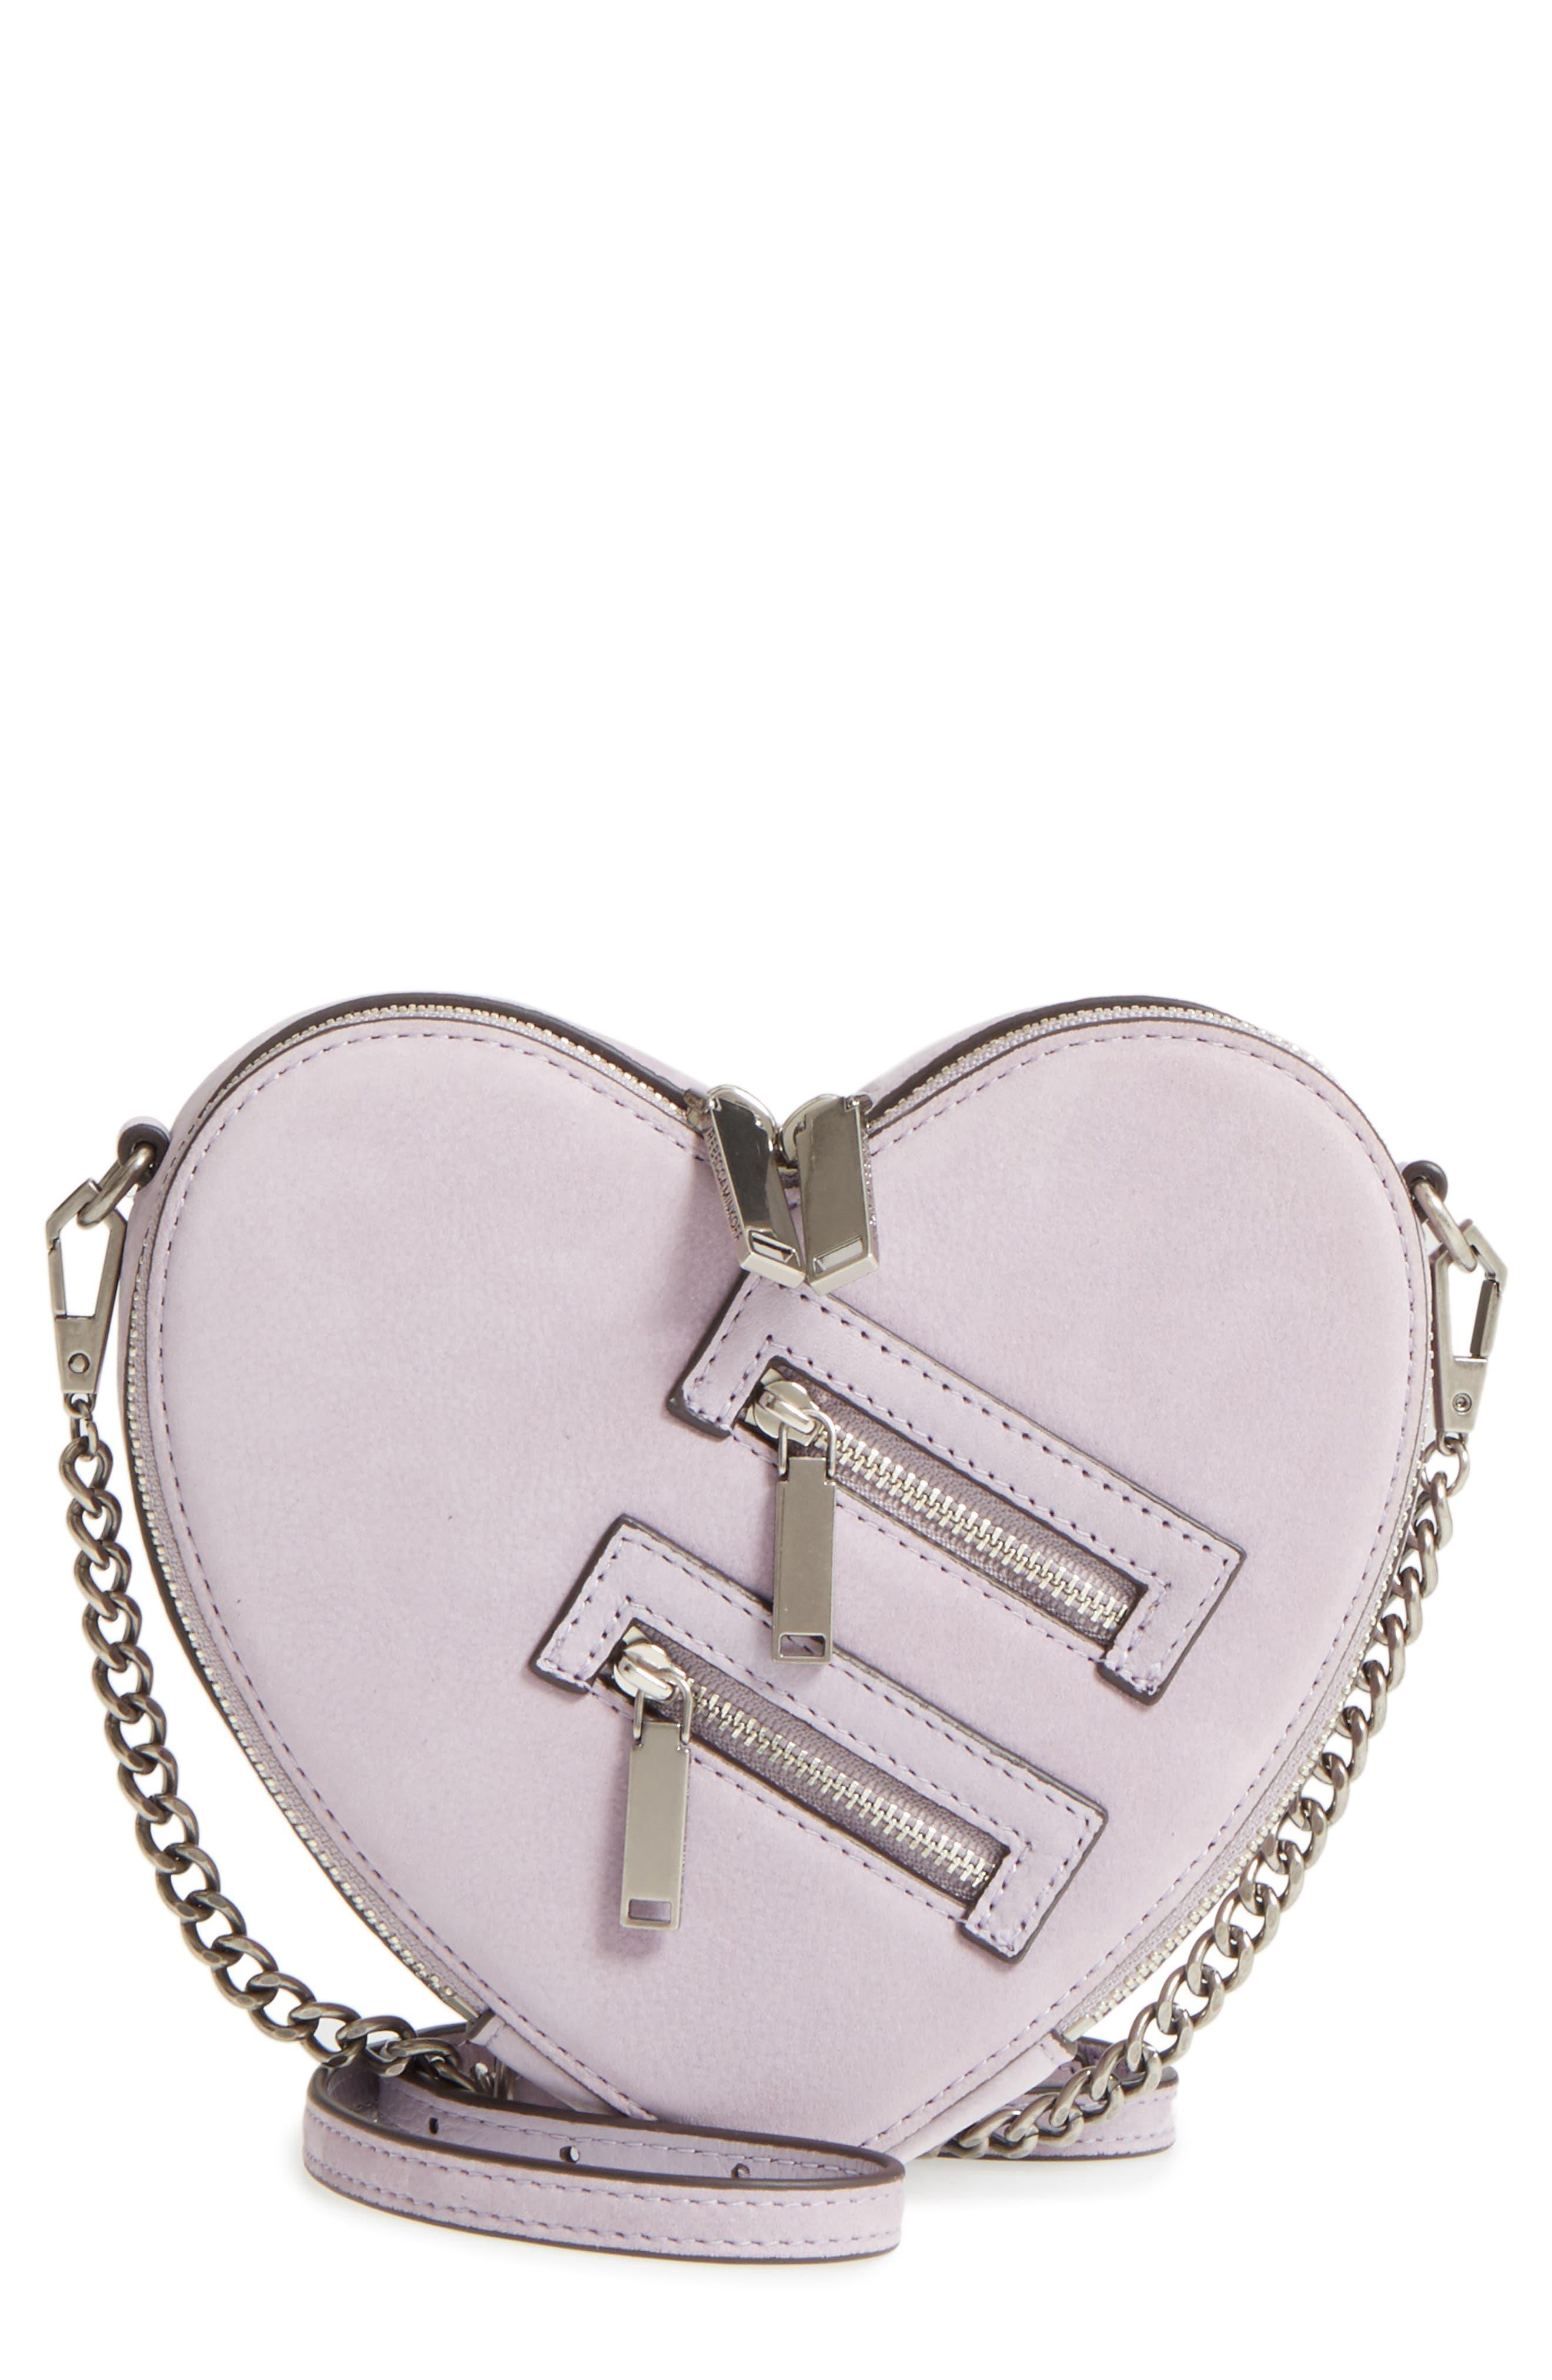 Alternate Image 1 Selected - Rebecca Minkoff Jamie Heart Leather Crossbody Bag